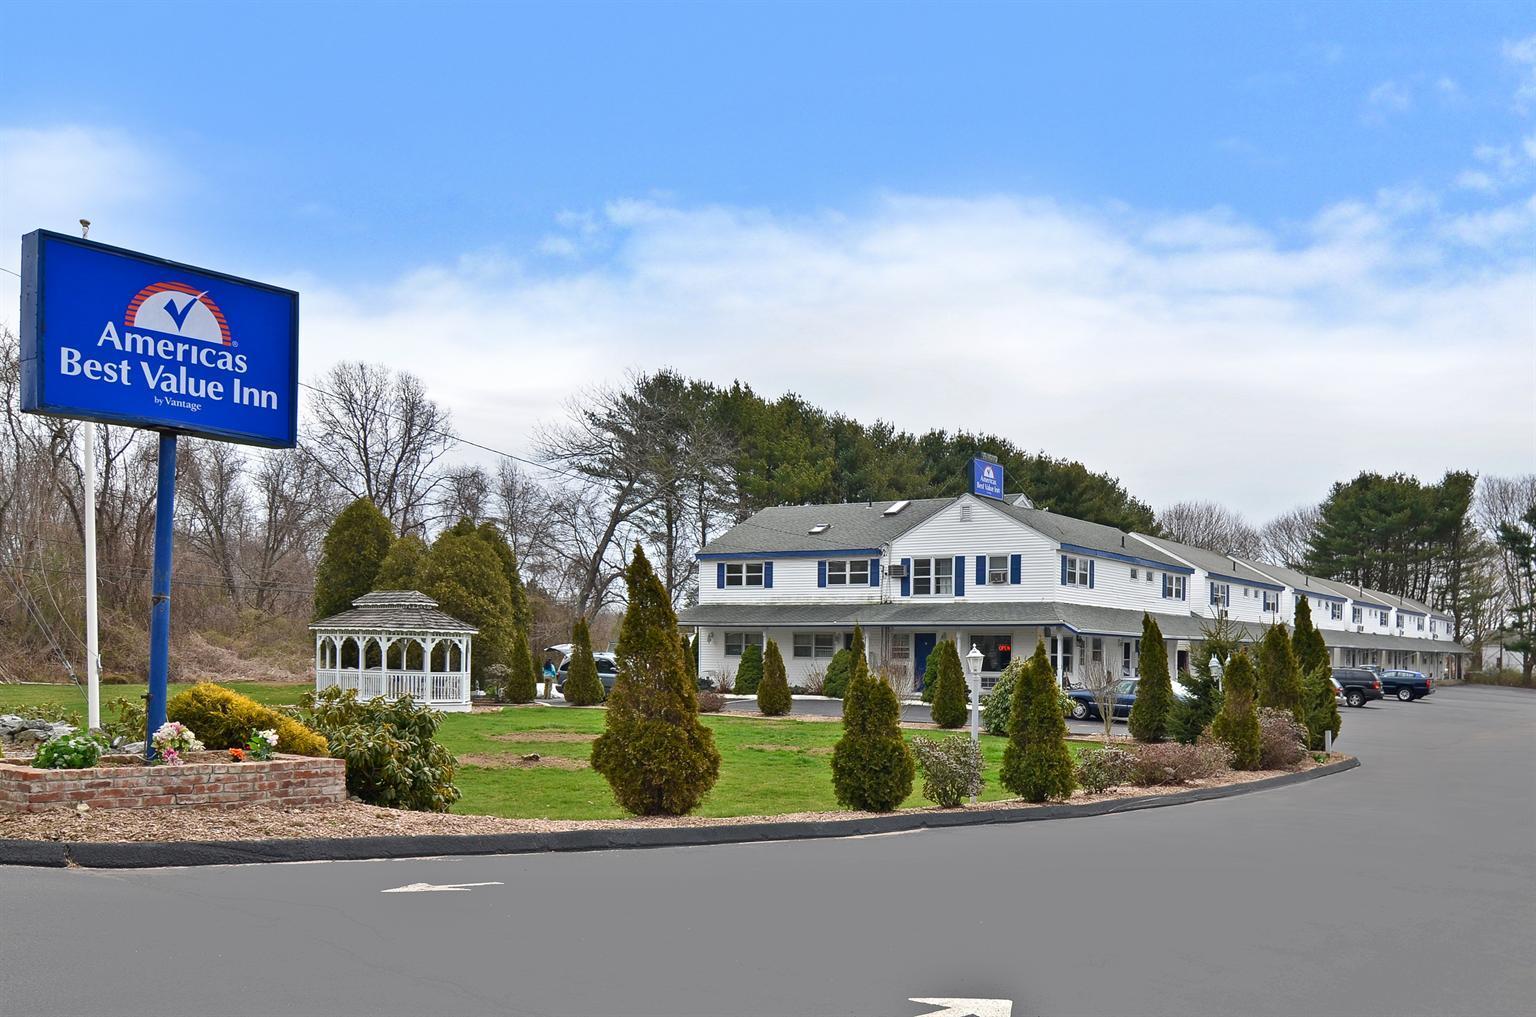 Americas Best Value Inn  Mystic  Stonington